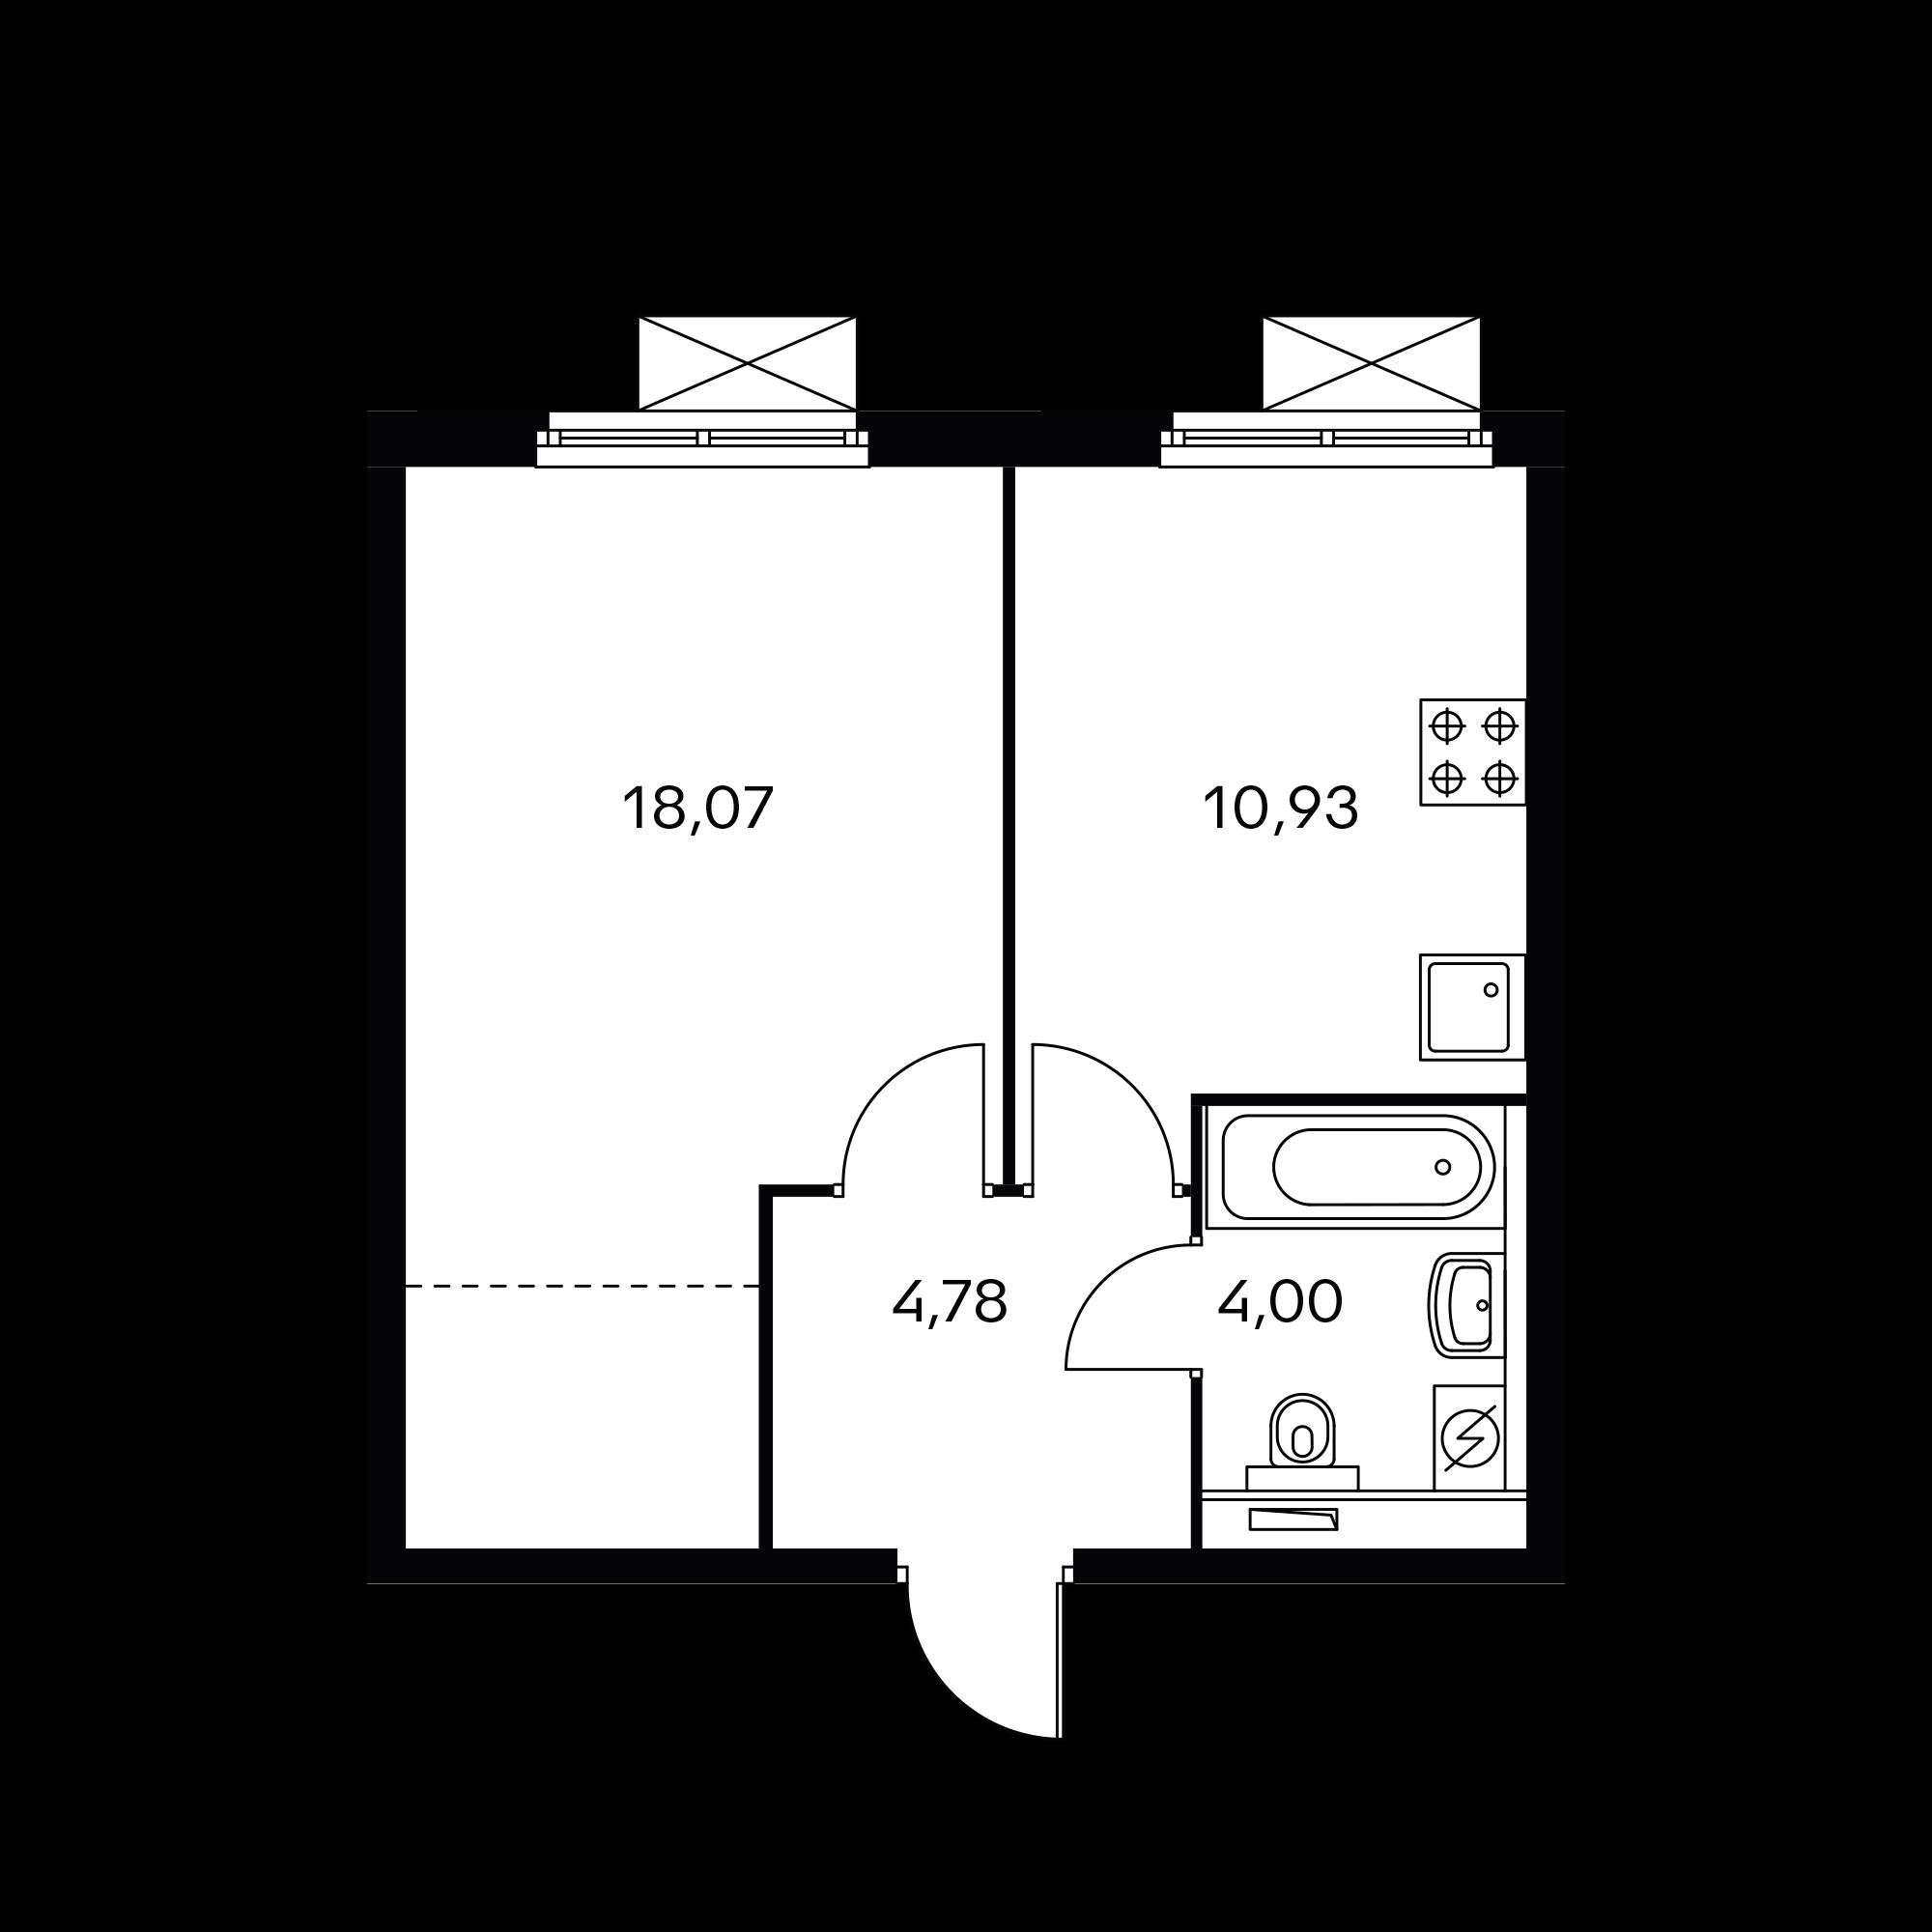 1KM1_6.6-2*